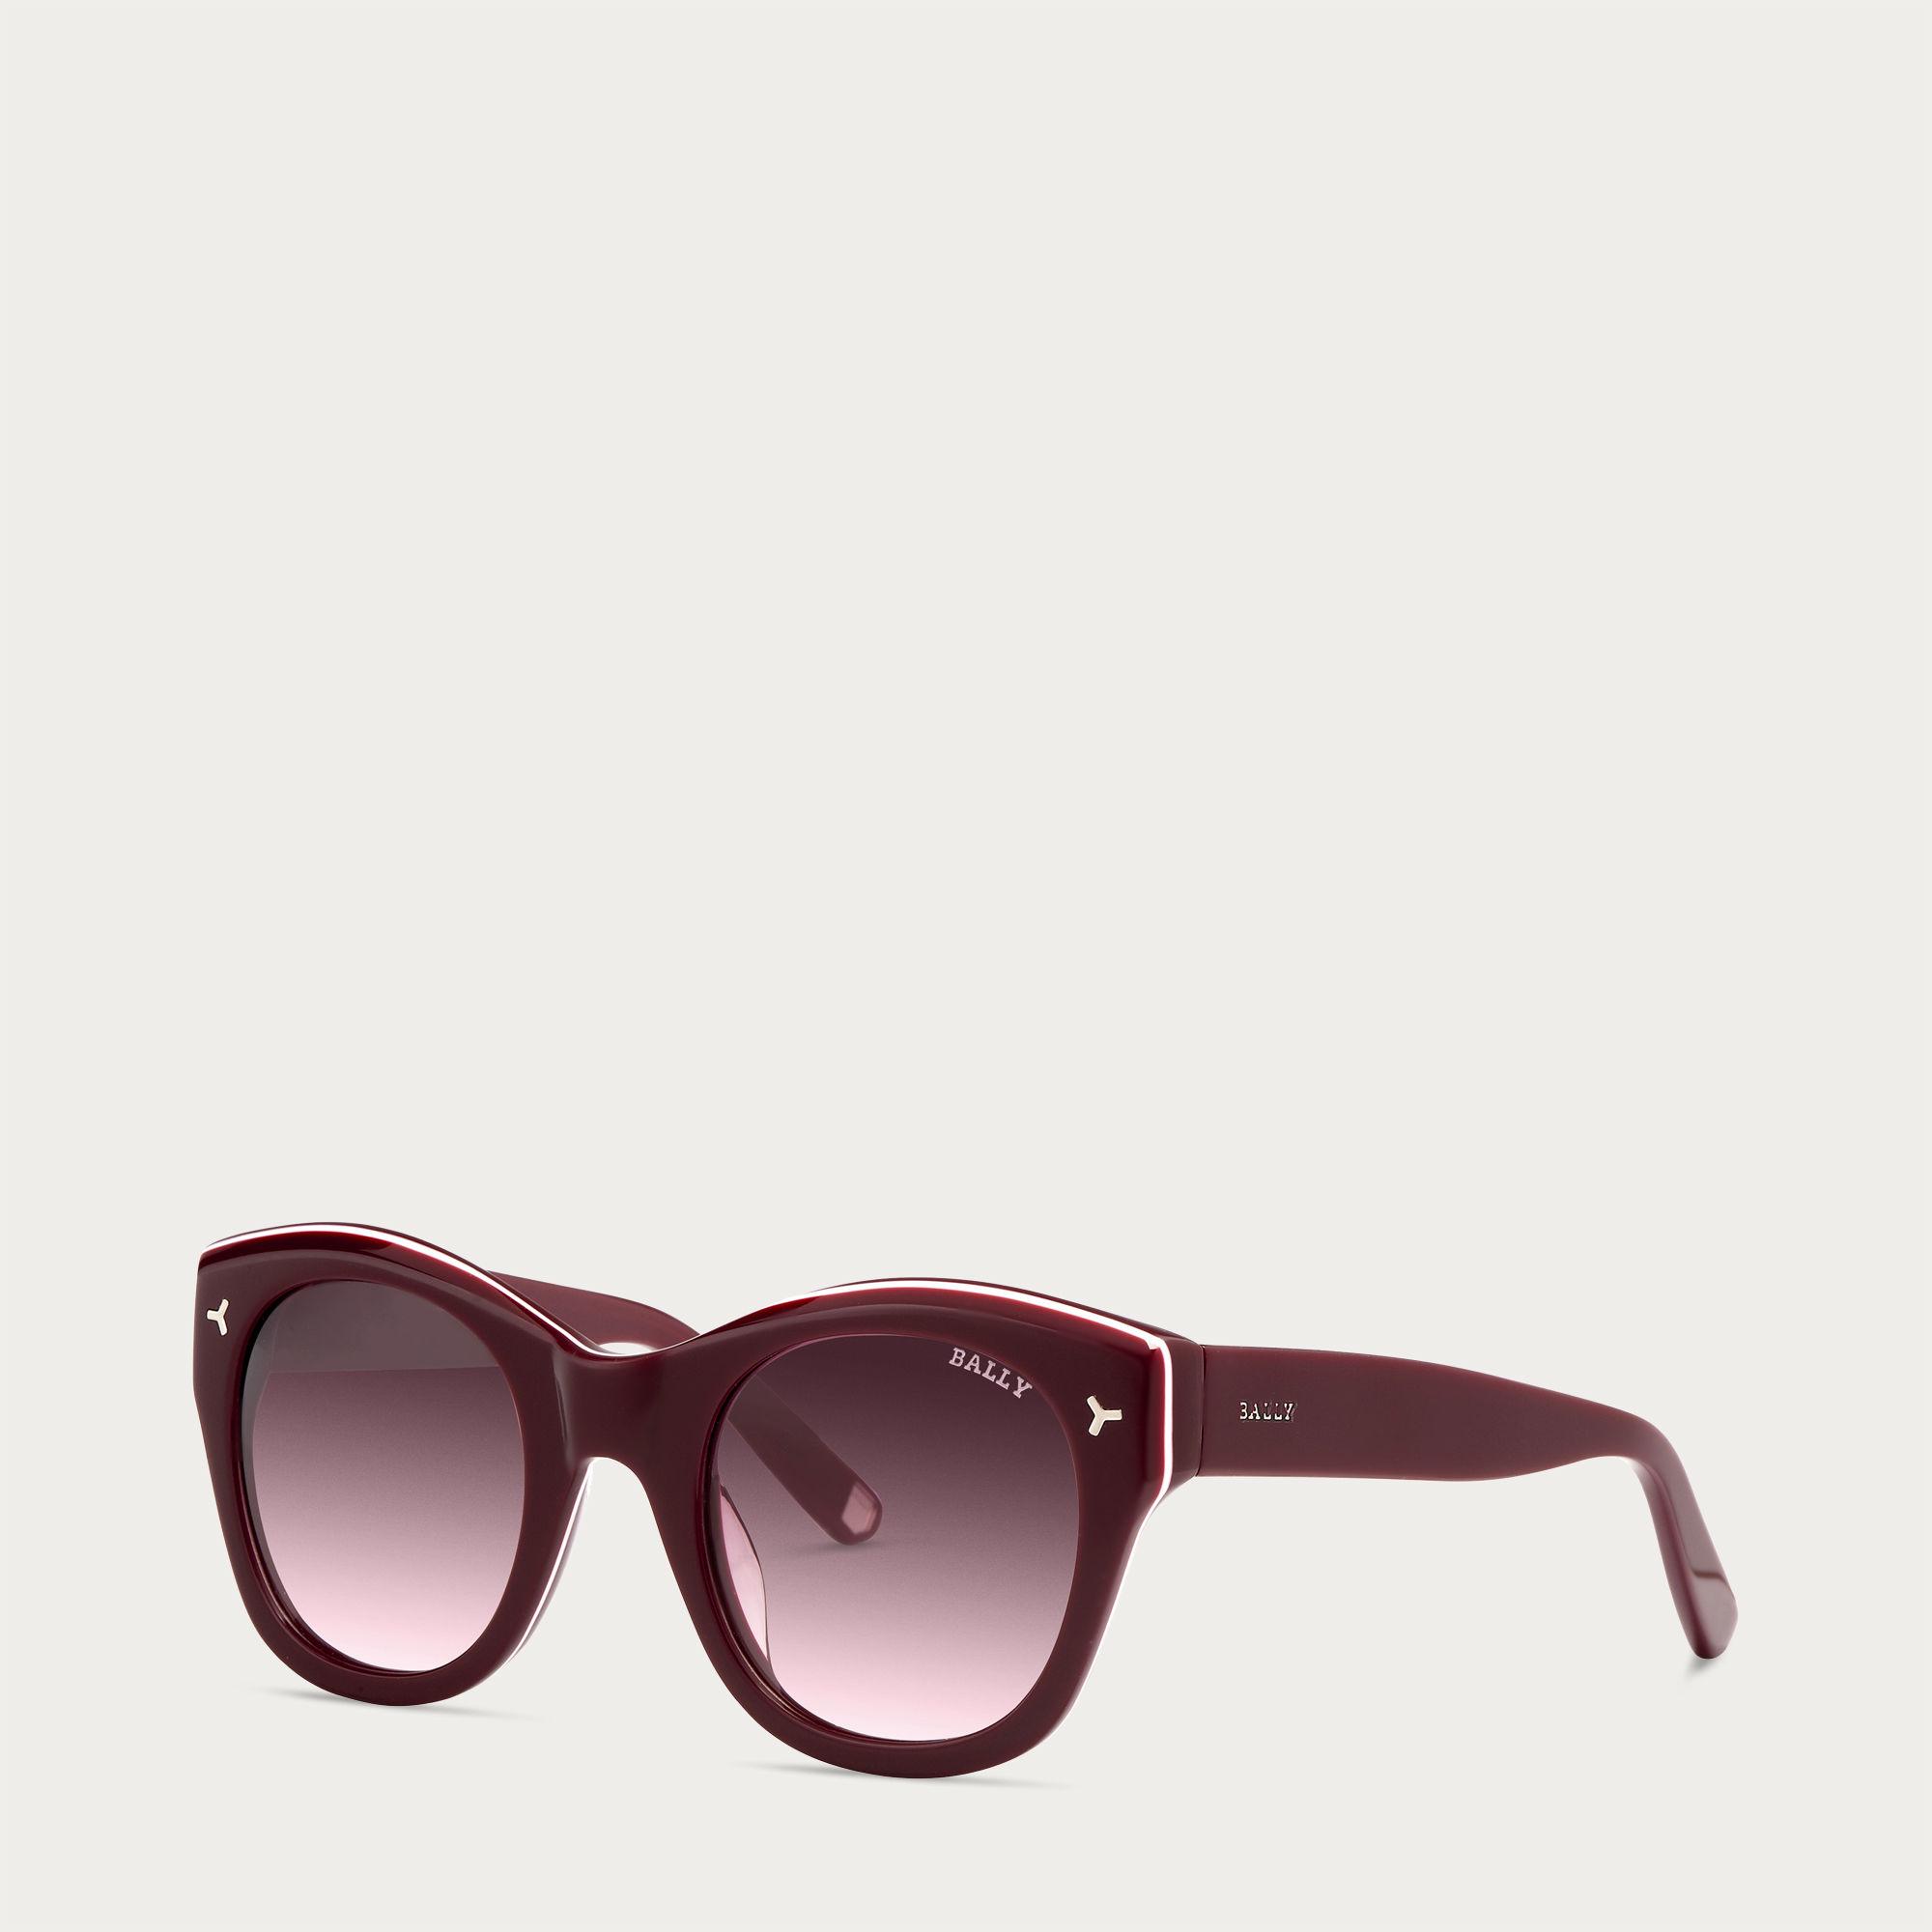 fa22053f0a Lyst - Bally Round Sunglasses Women ́s Burgundy Acetate Sunglasses ...